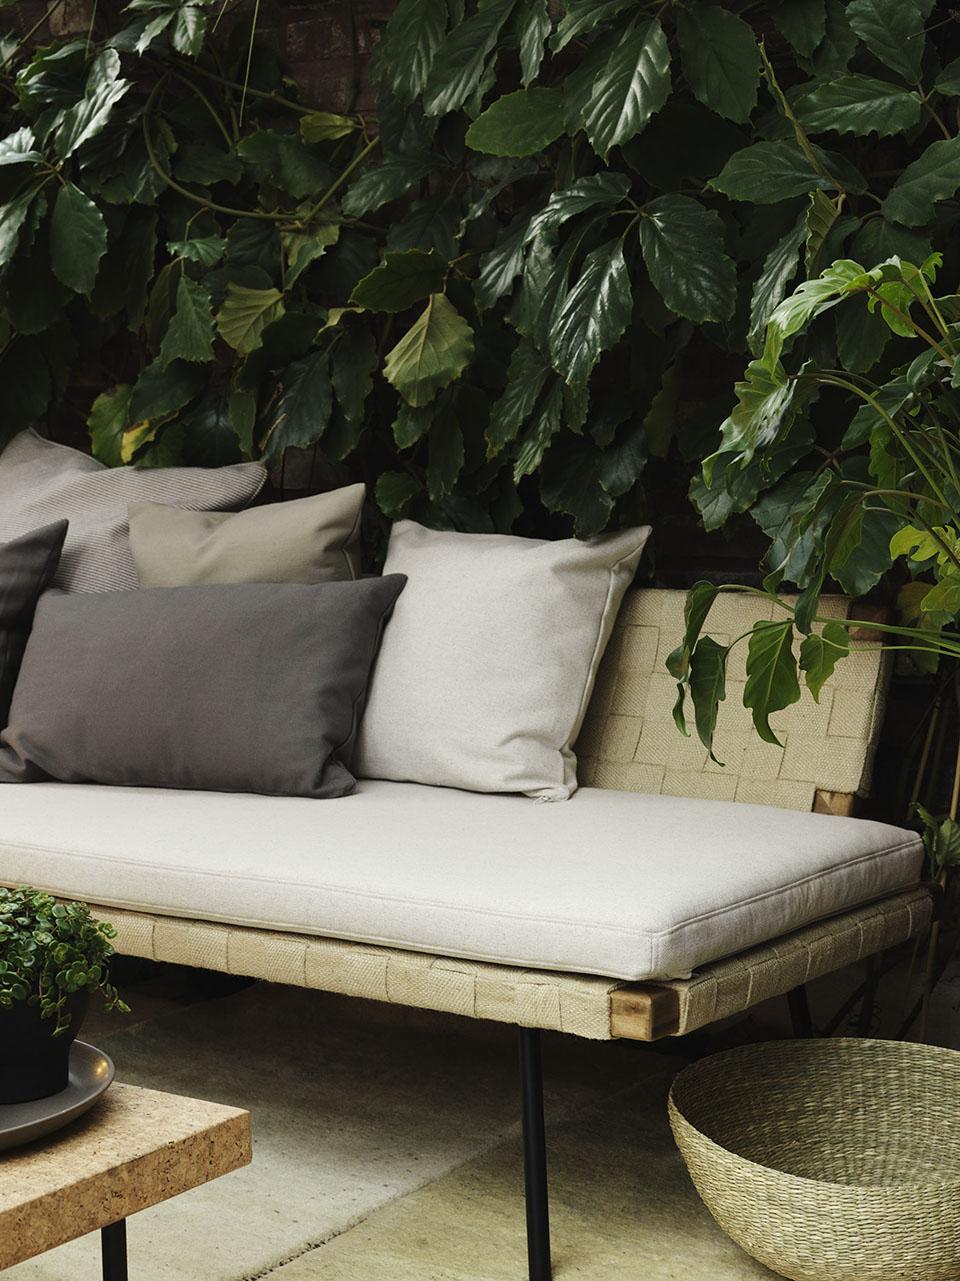 Ikea x Ilse Crawford   MilK decoration on Belham Living Lilianna Outdoor Daybed id=21194